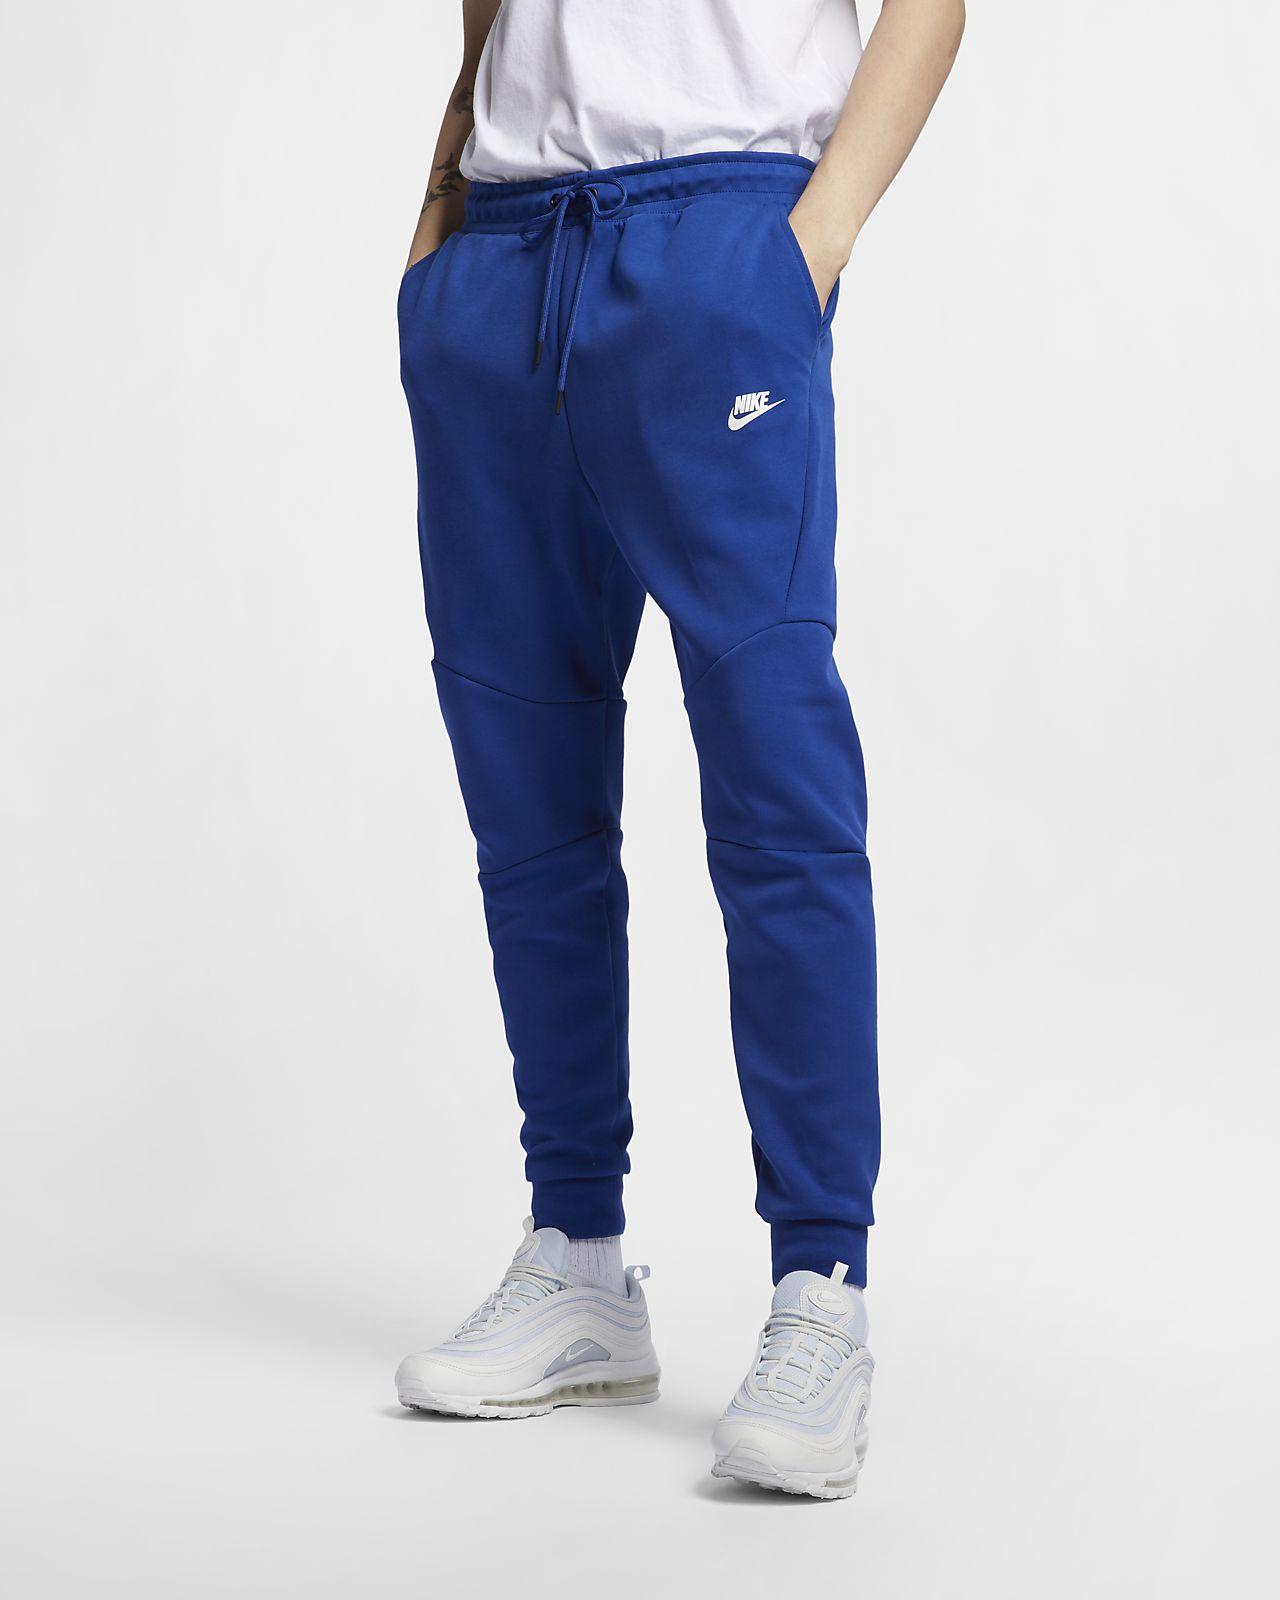 85e345f372 Nike Sportswear Tech Fleece férfi szabadidőnadrág. Nike.com HU